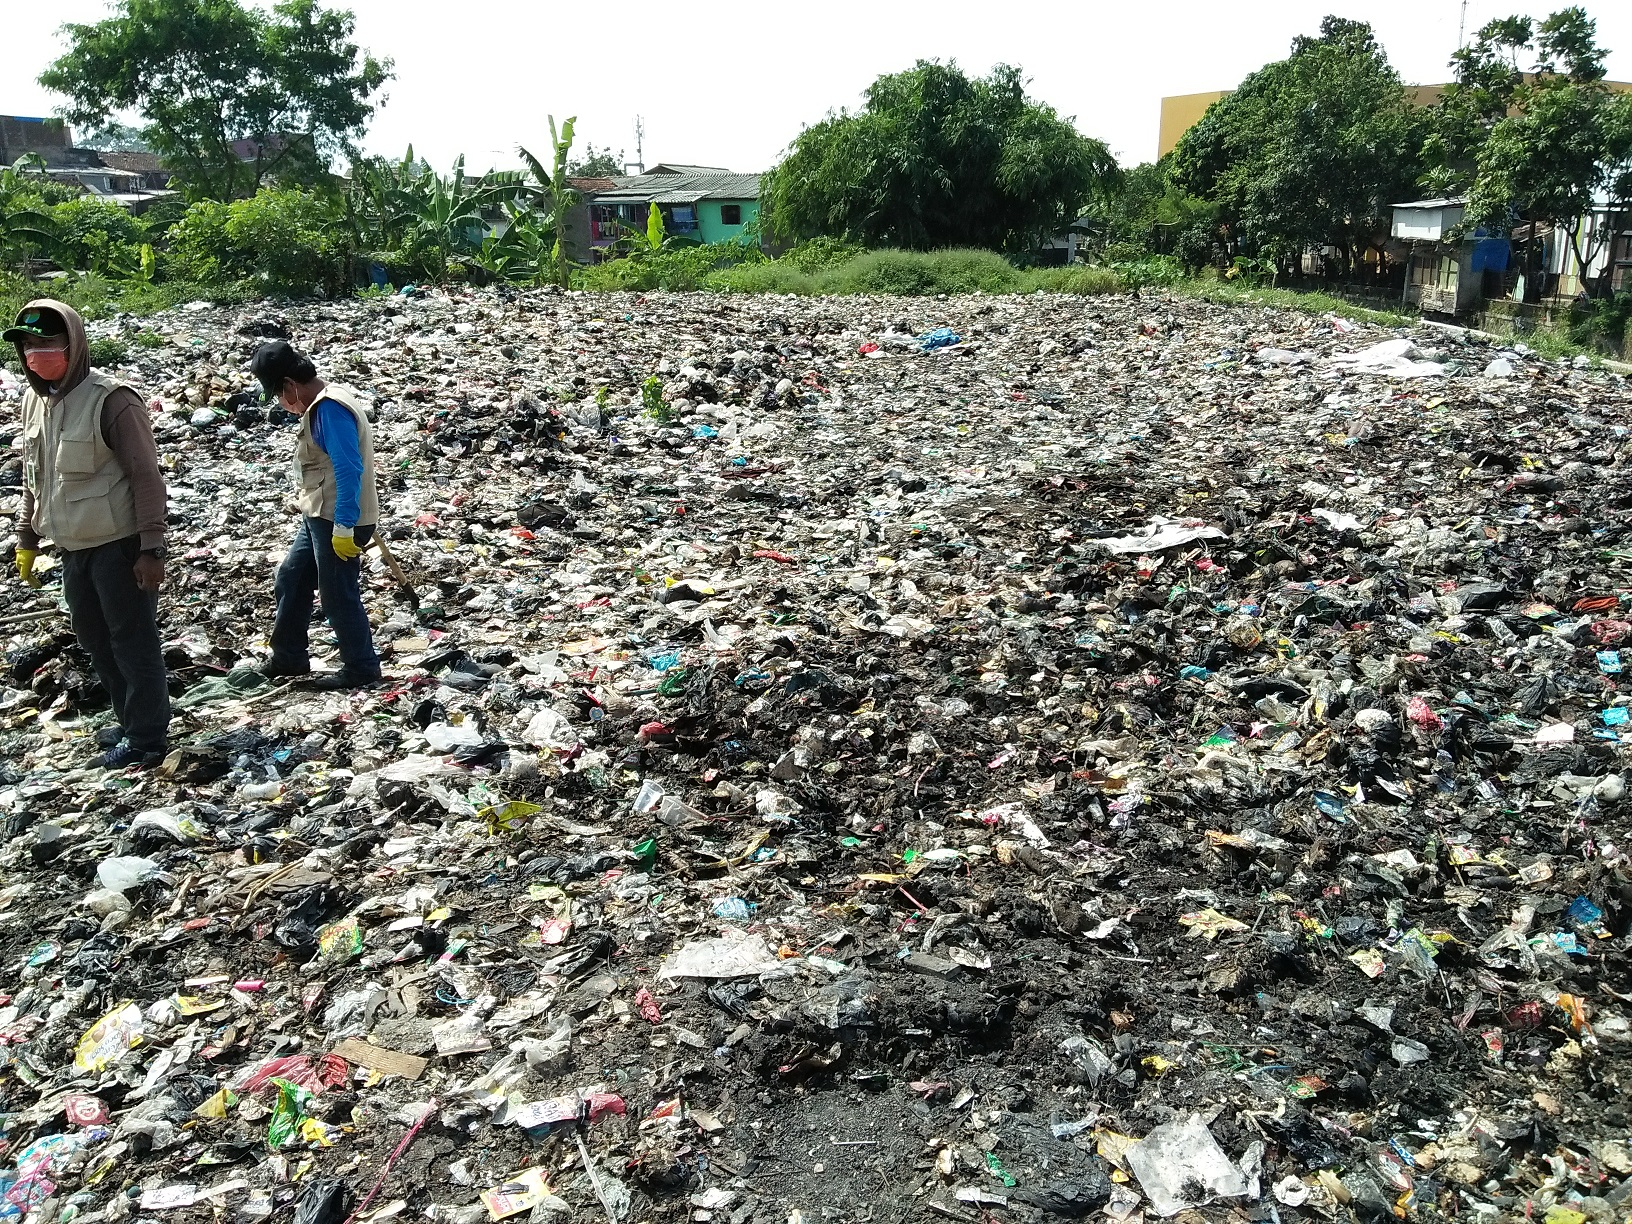 Dinas Lingkungan Hidup dan Kebersihan (DLHK) mulai membersihkan 'lautan sampah' di Kelurahan Cibangkong, Batununggal, Kota Bandung, Kamis (6/7). Kebiasaan masyarakat membuang sampah di tempat ini sudah sejak 10 tahun silam. (Jurnalposmedia/Zaira Farah Diba).